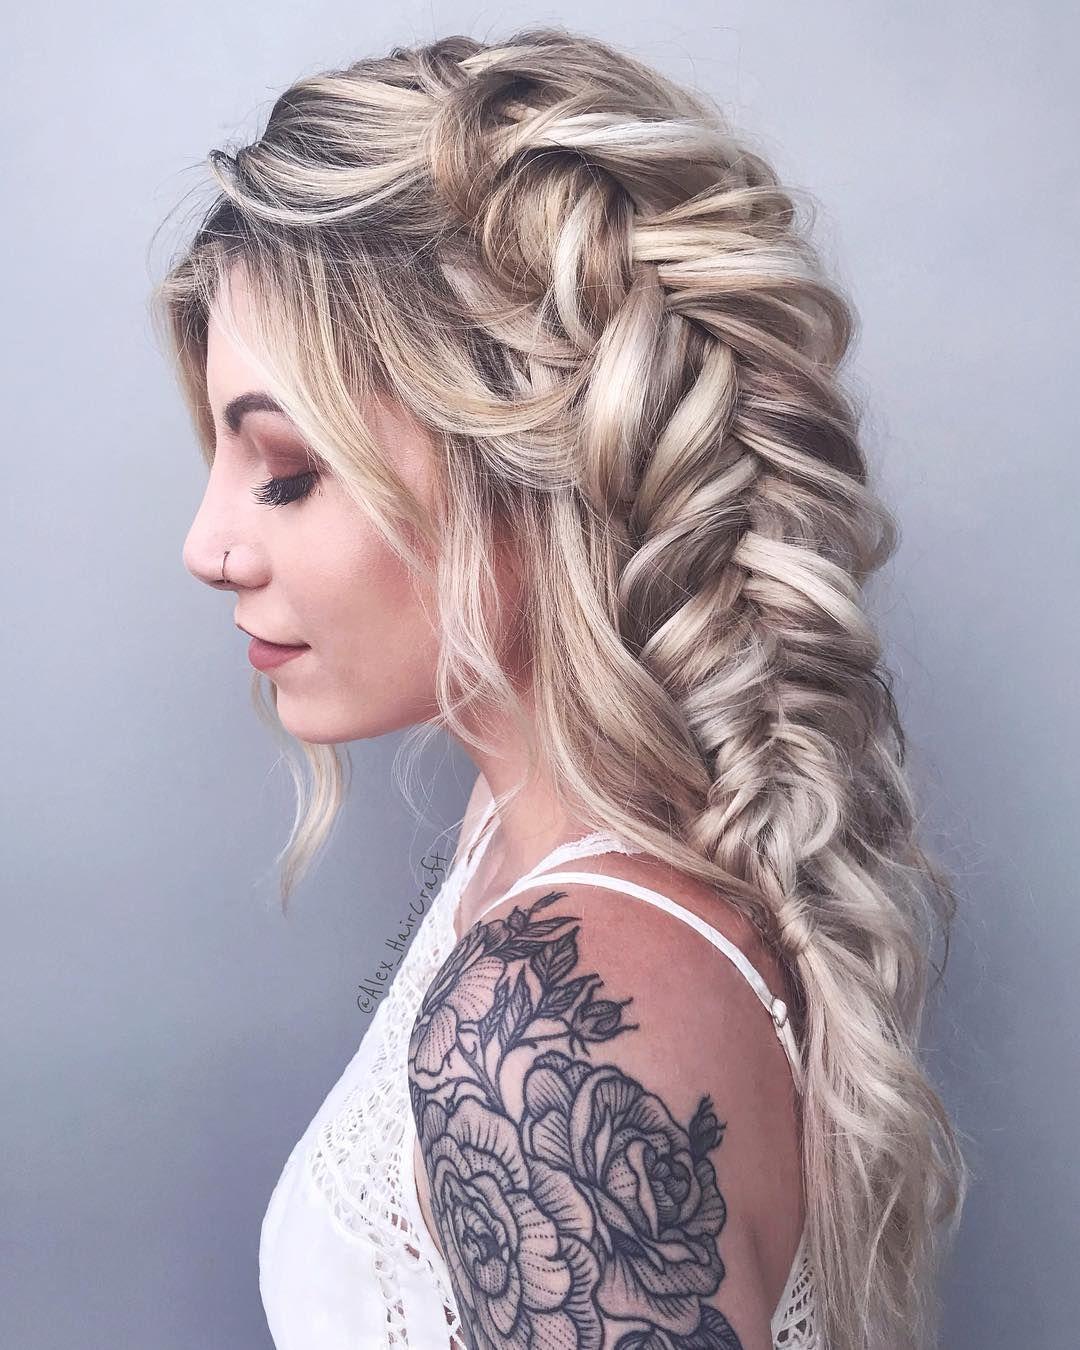 Gorgeous braided hairstyles alex pelerossi hair pinterest